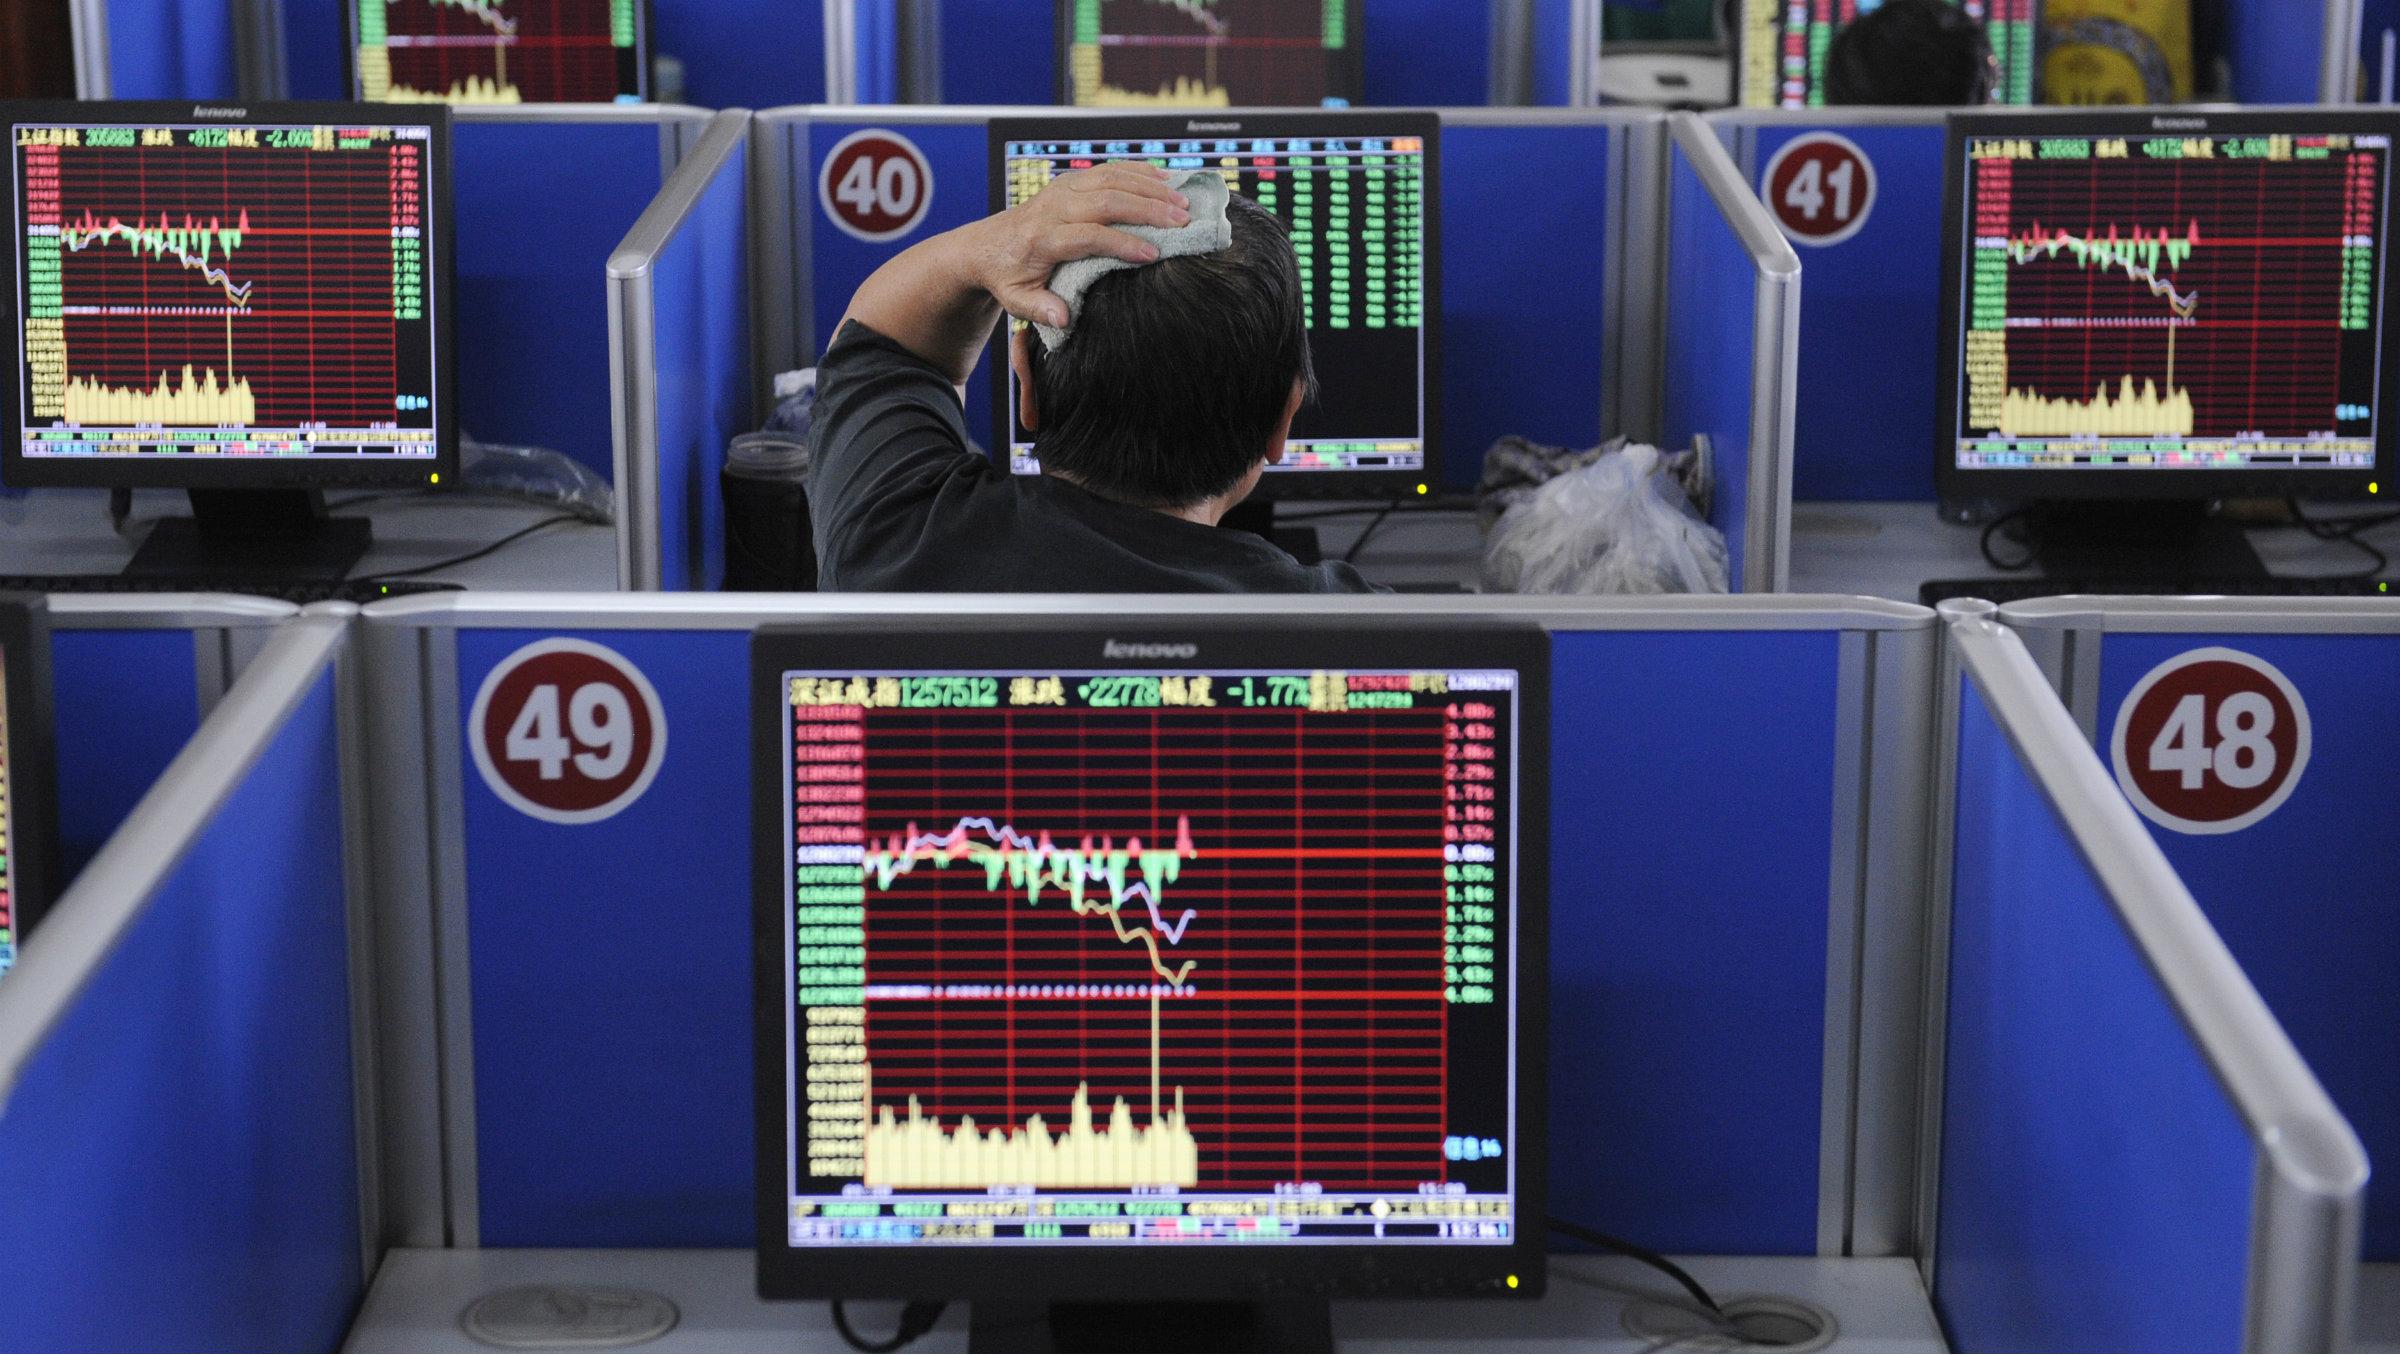 China stocks on screen